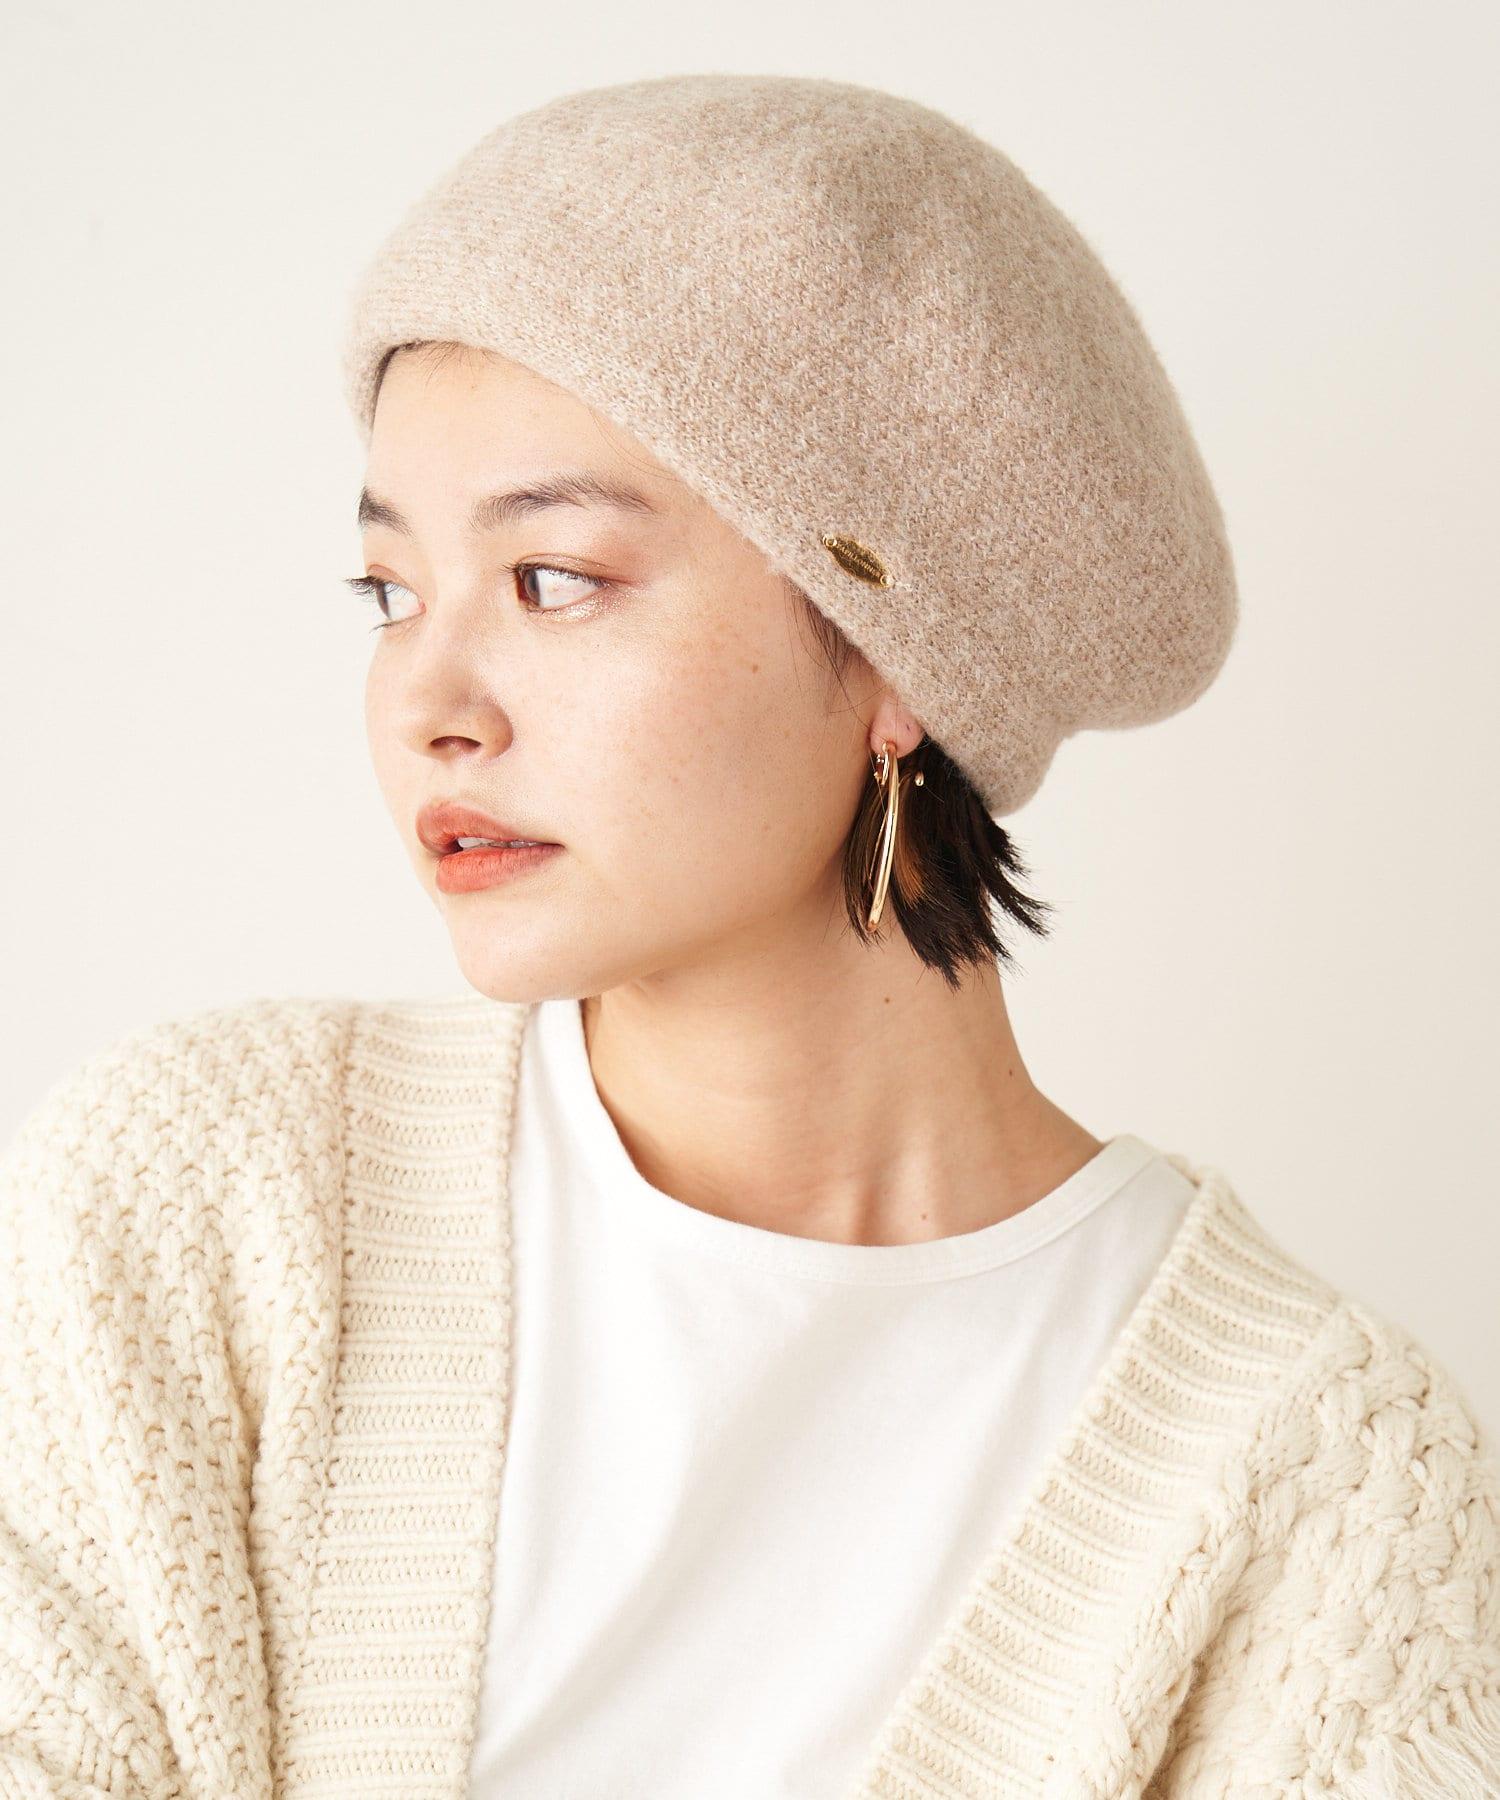 COLLAGE GALLARDAGALANTE(コラージュ ガリャルダガランテ) 【PAPILLONNER/パピヨネ】ソフトベレー帽